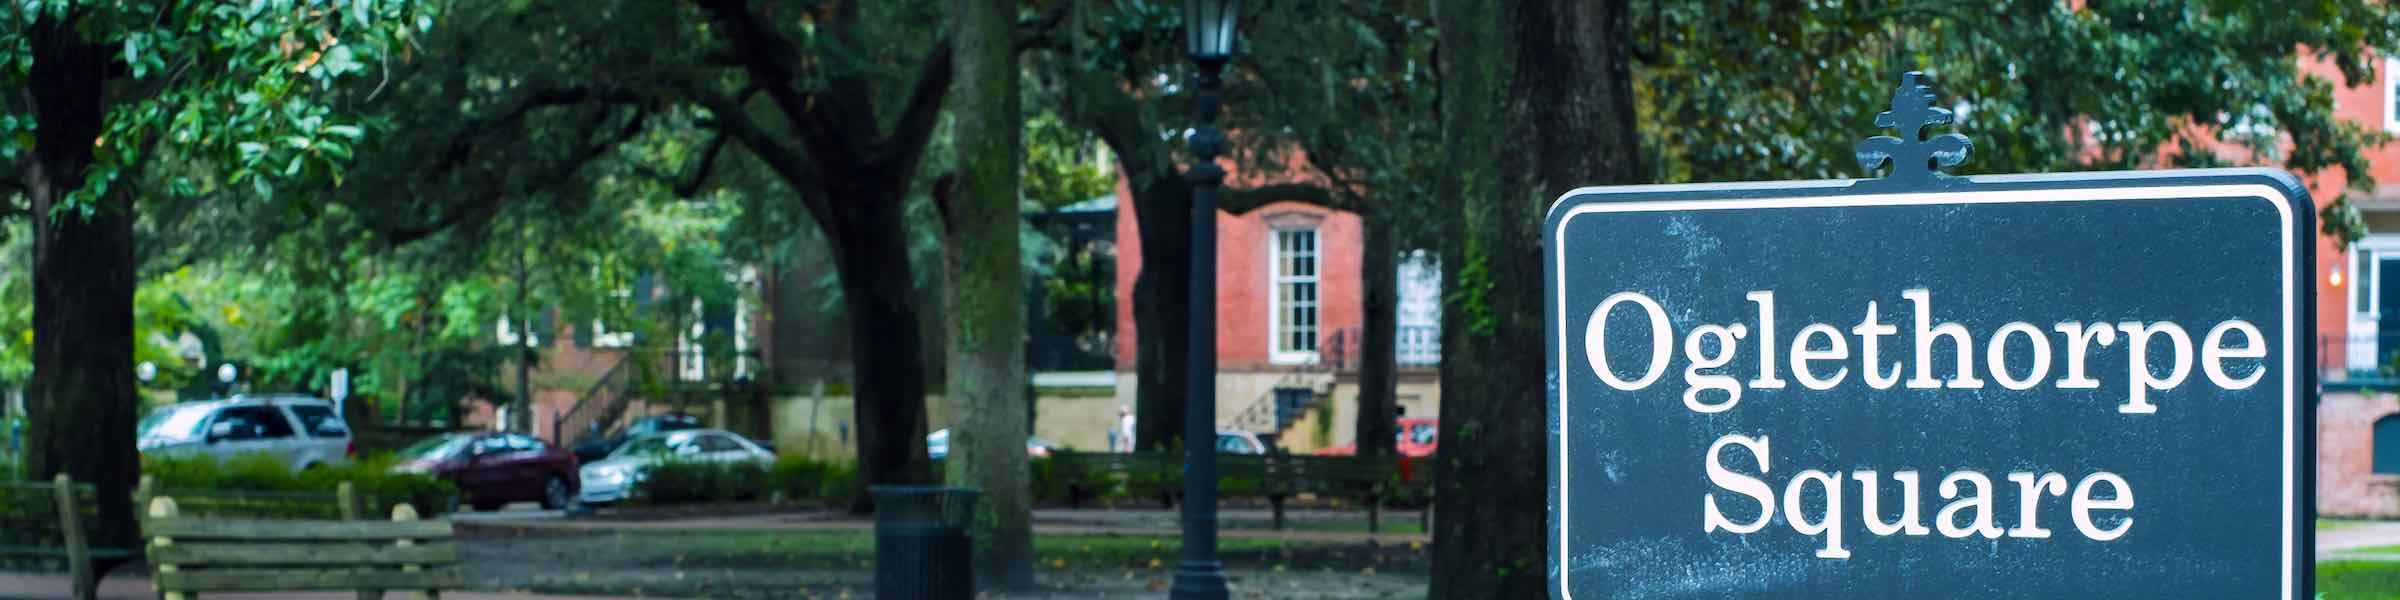 A sign marking Oglethorpe Square, in Savannah, GA.